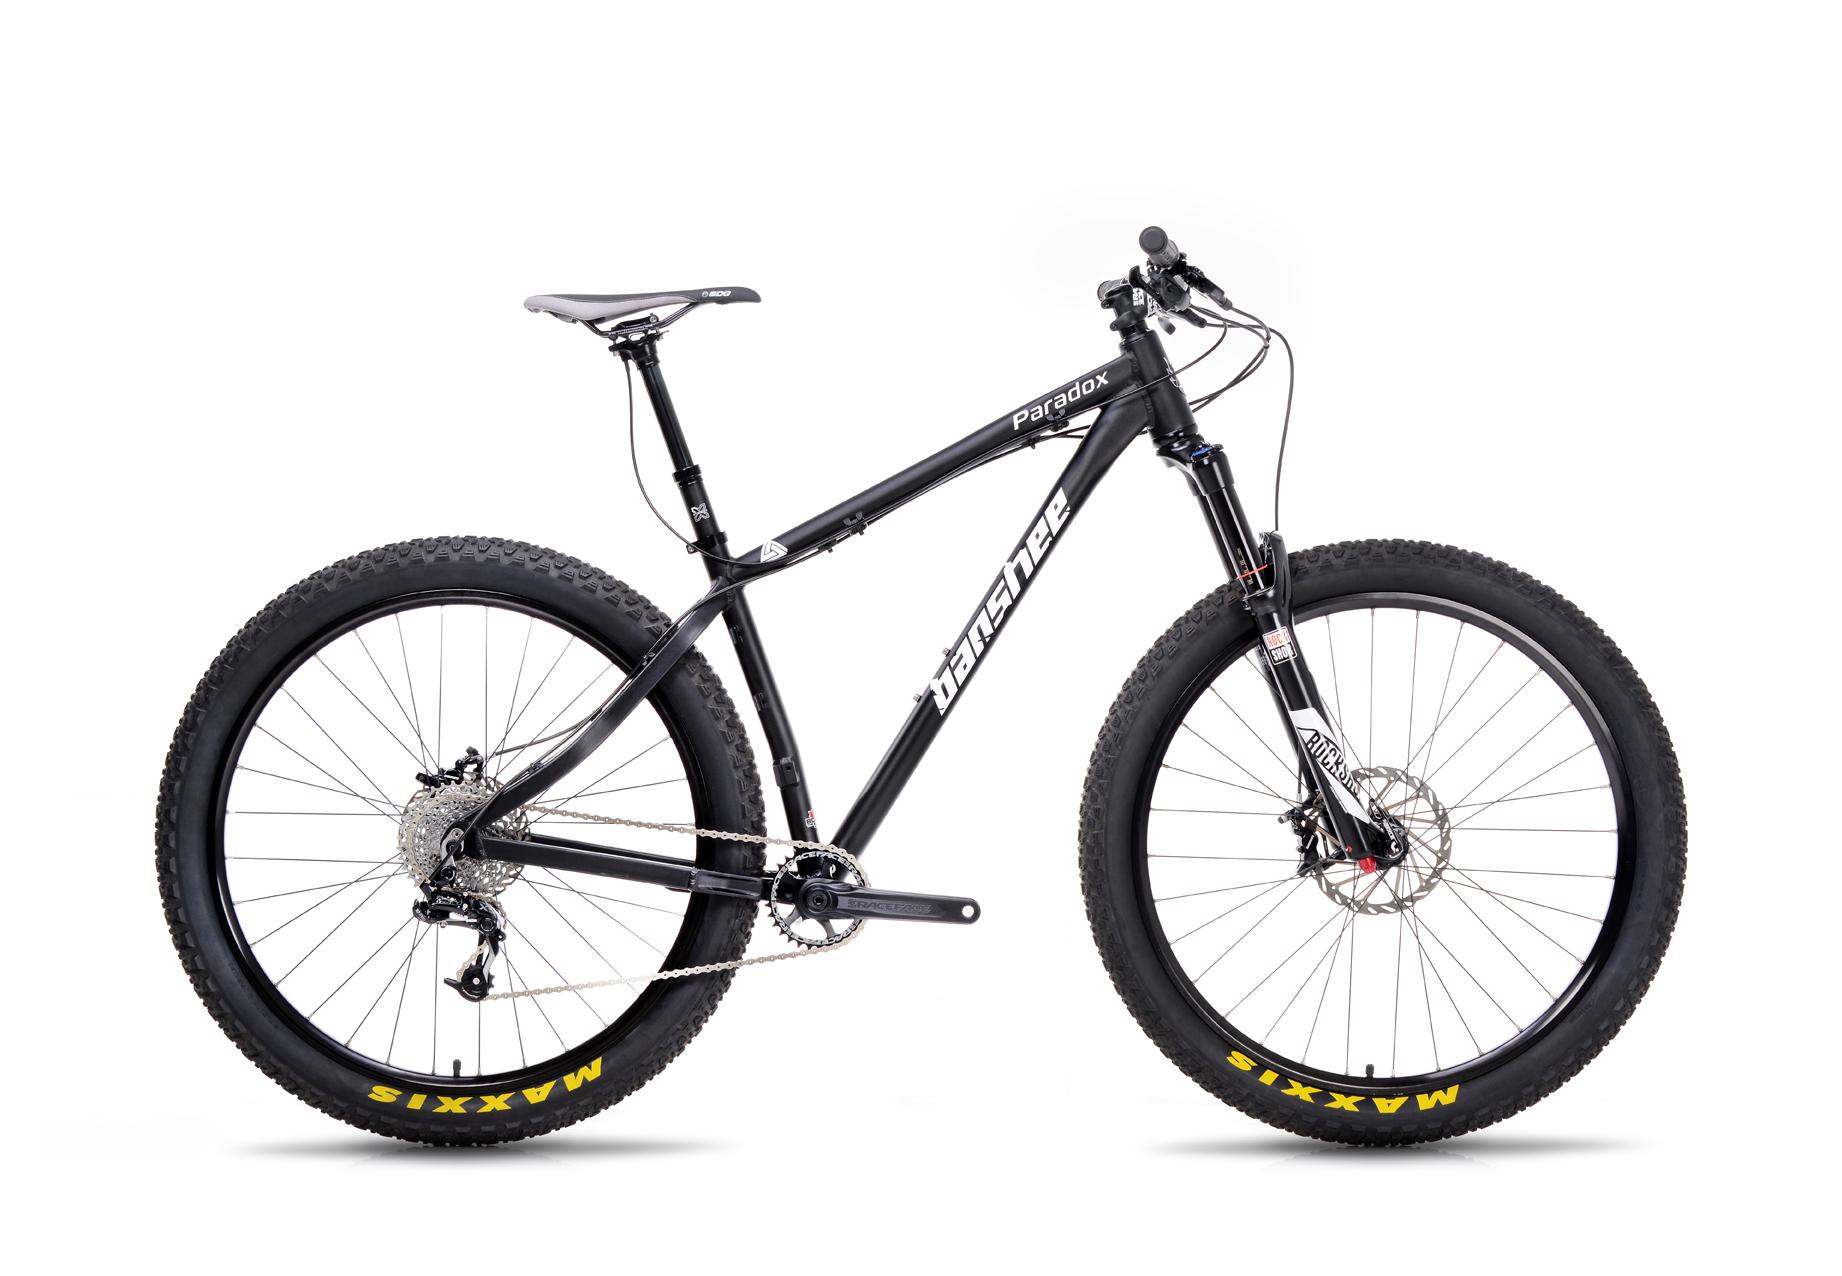 Banshee throws 650b wheels on most 2016 mountain bikes